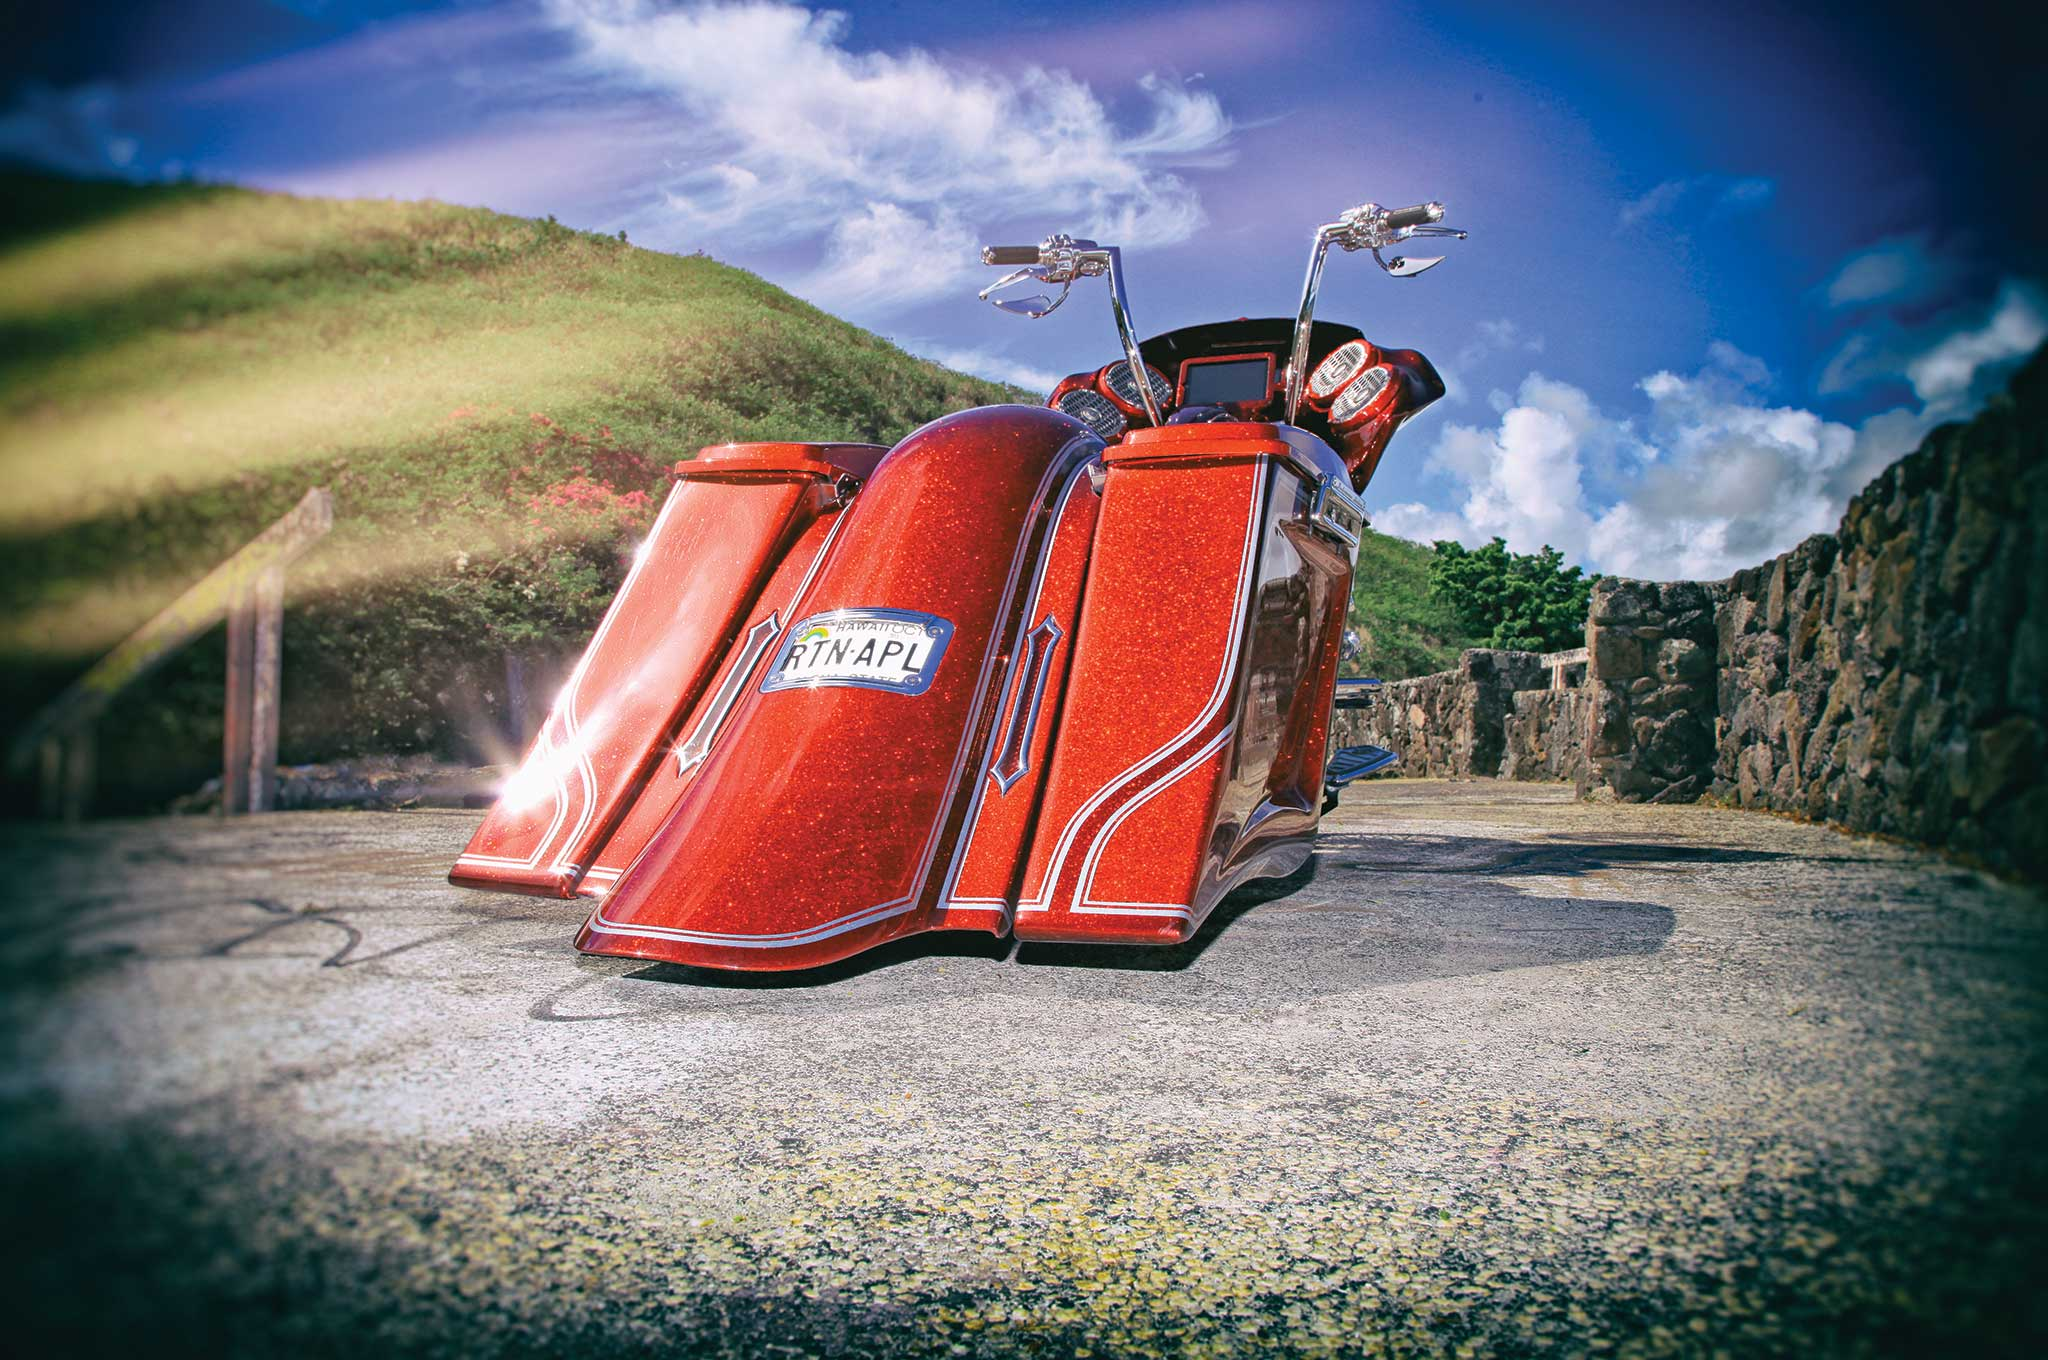 005 2013 harley davidson road glide rear fenders